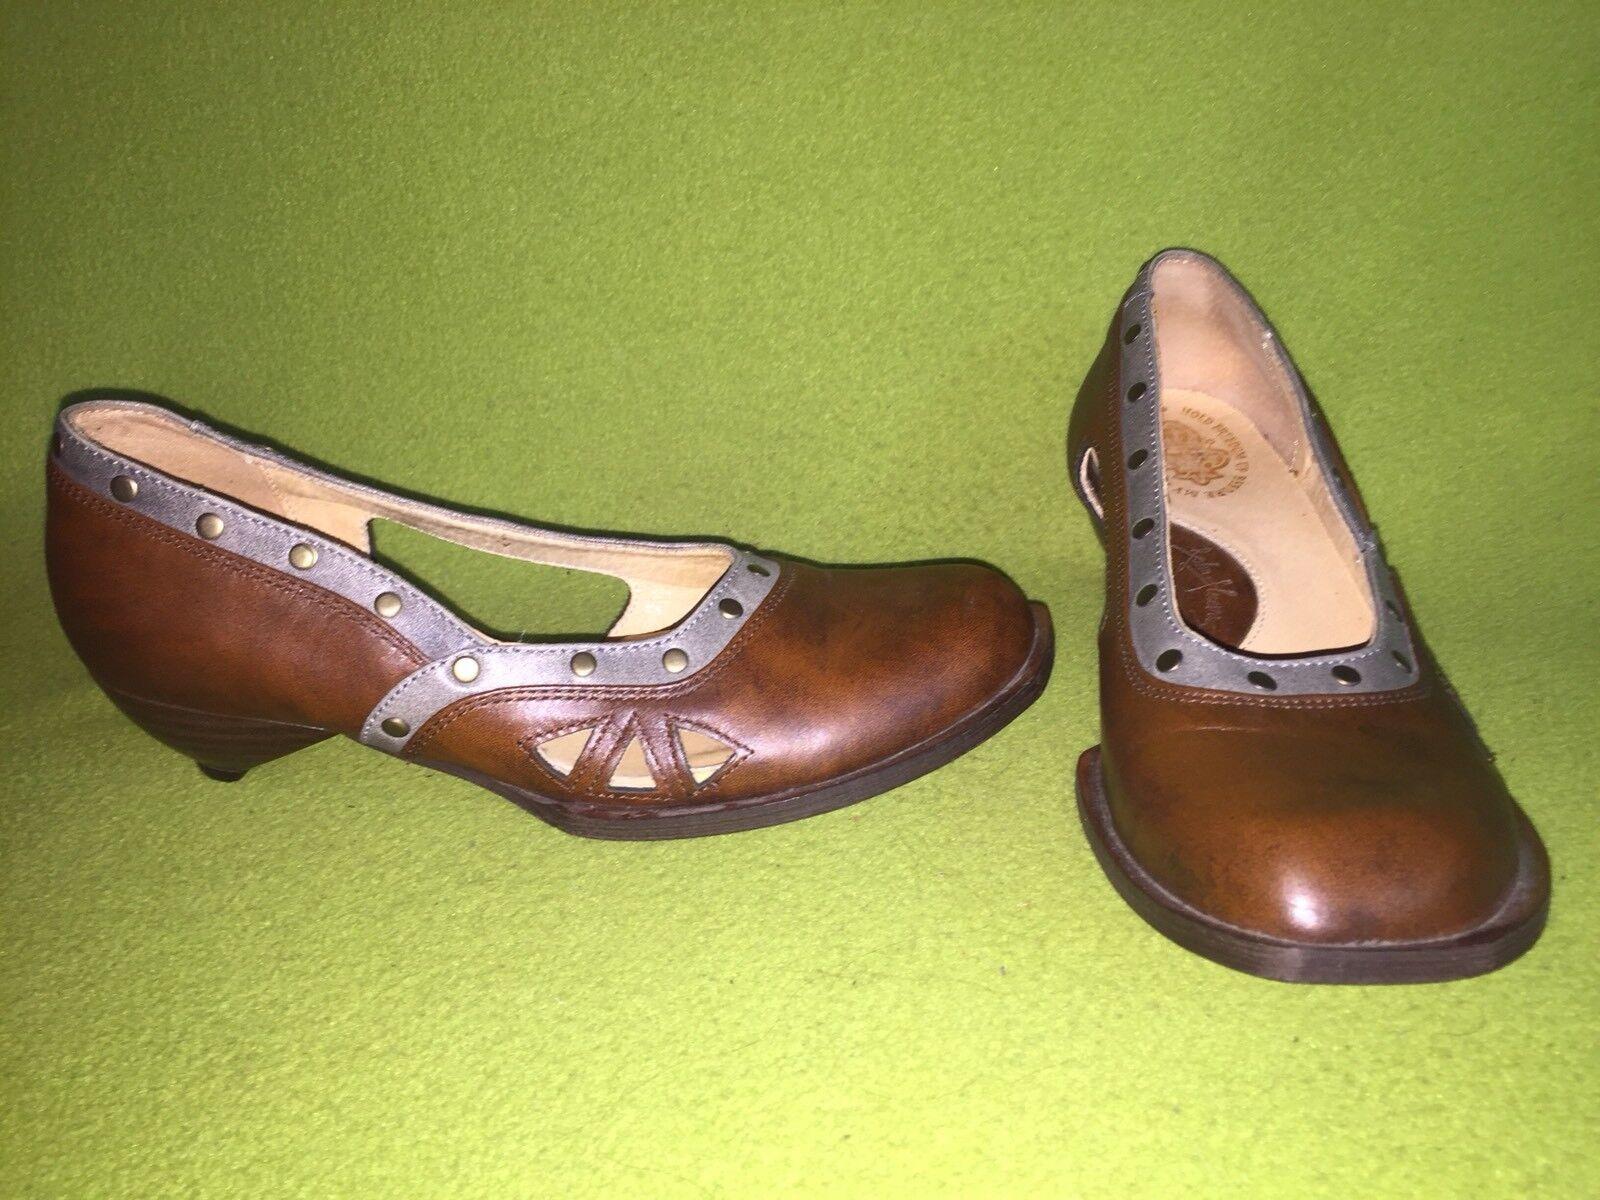 Brown & Grey Fluevog Freedom Kitten Heels 6.5